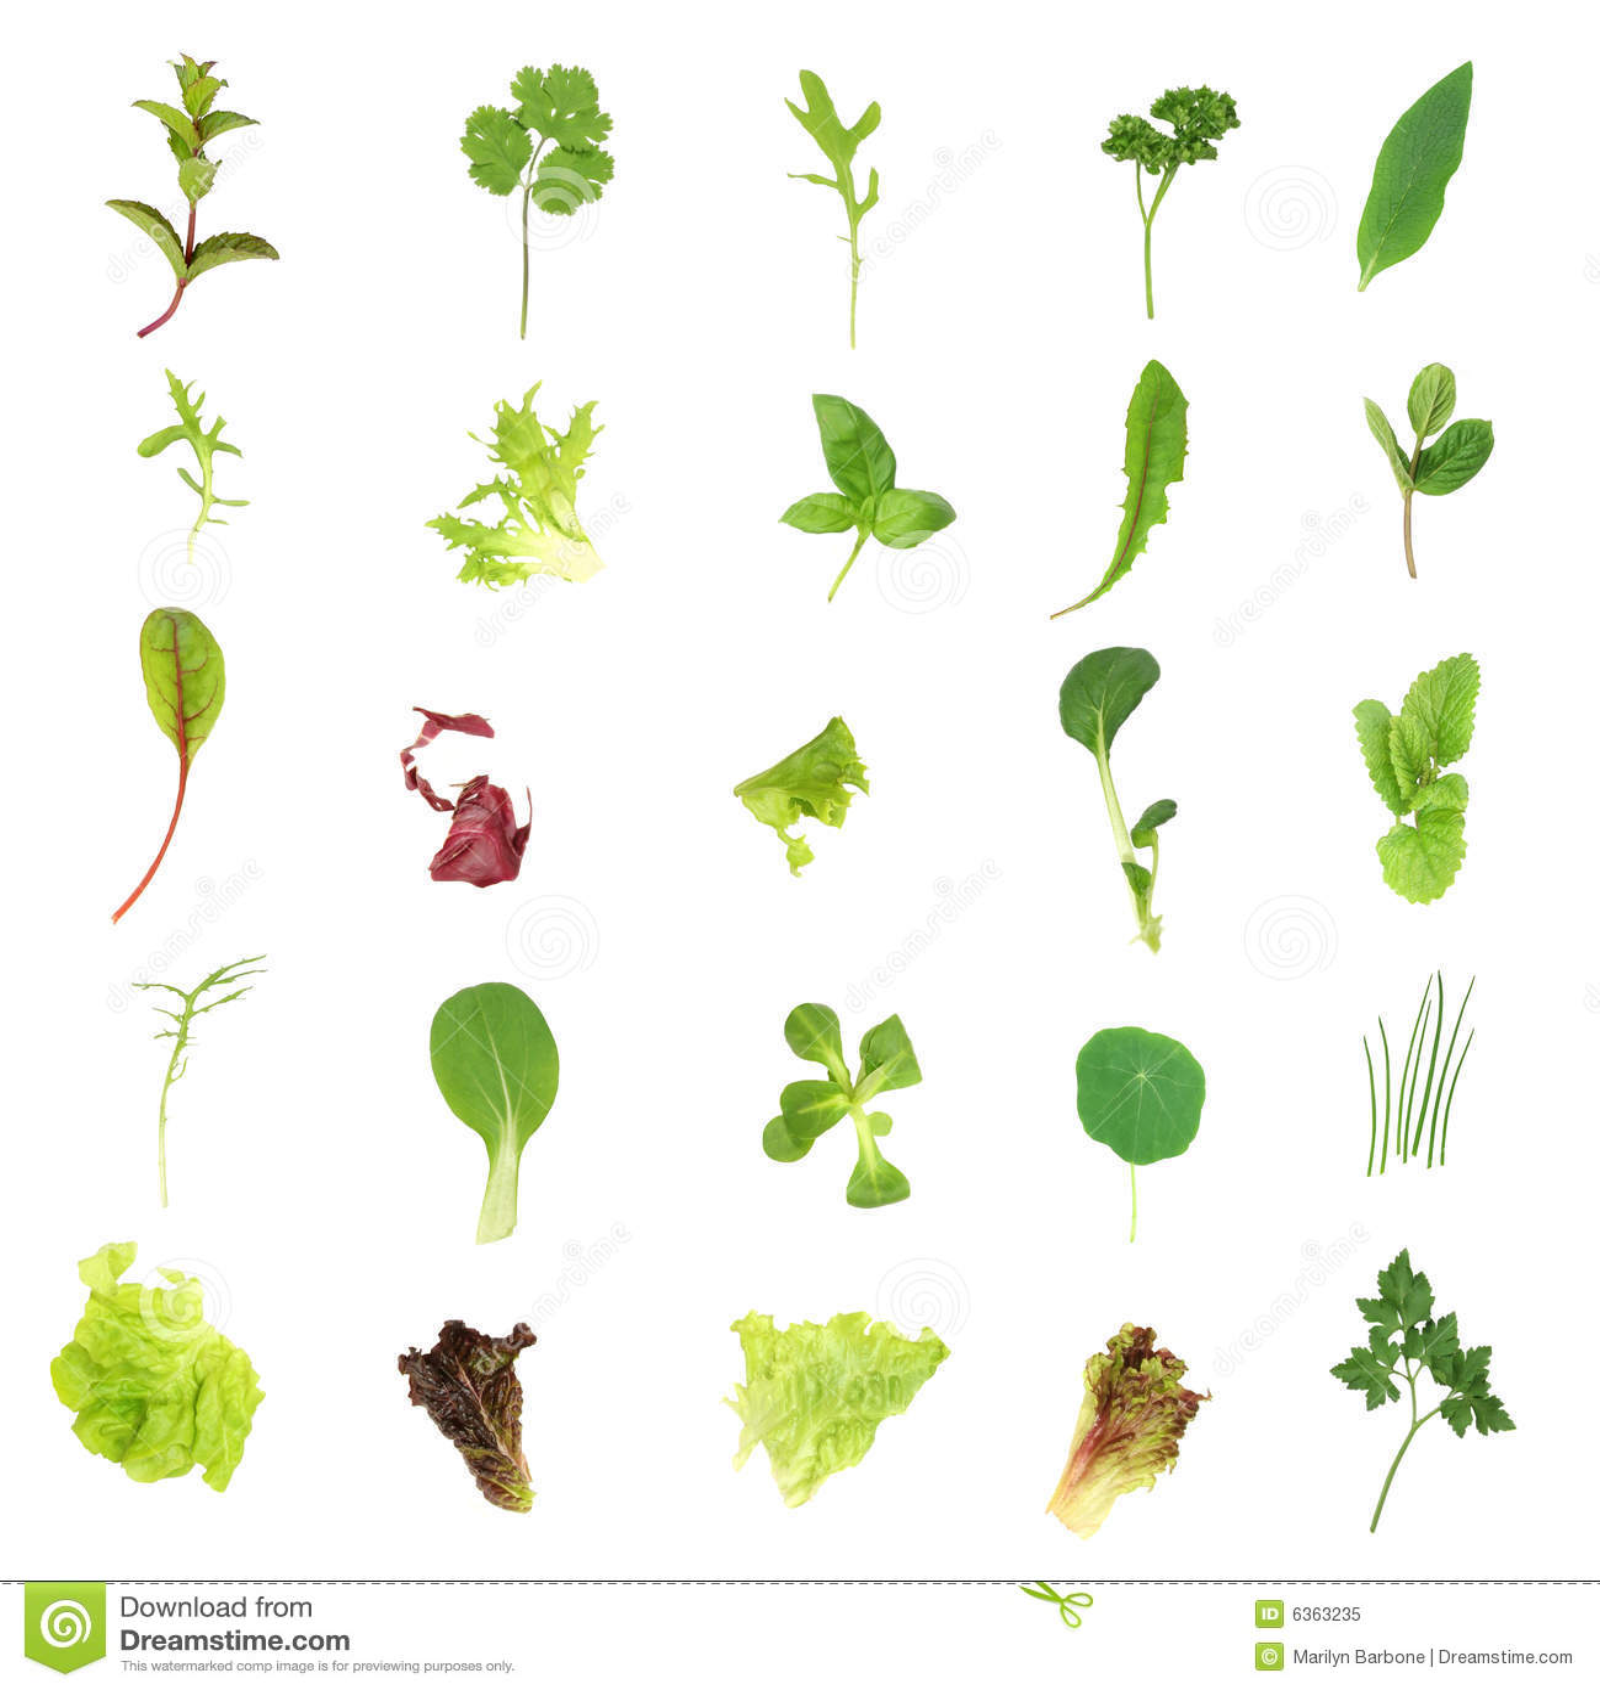 ... salad lettuce and herb leaves set over white background mr no pr no 4